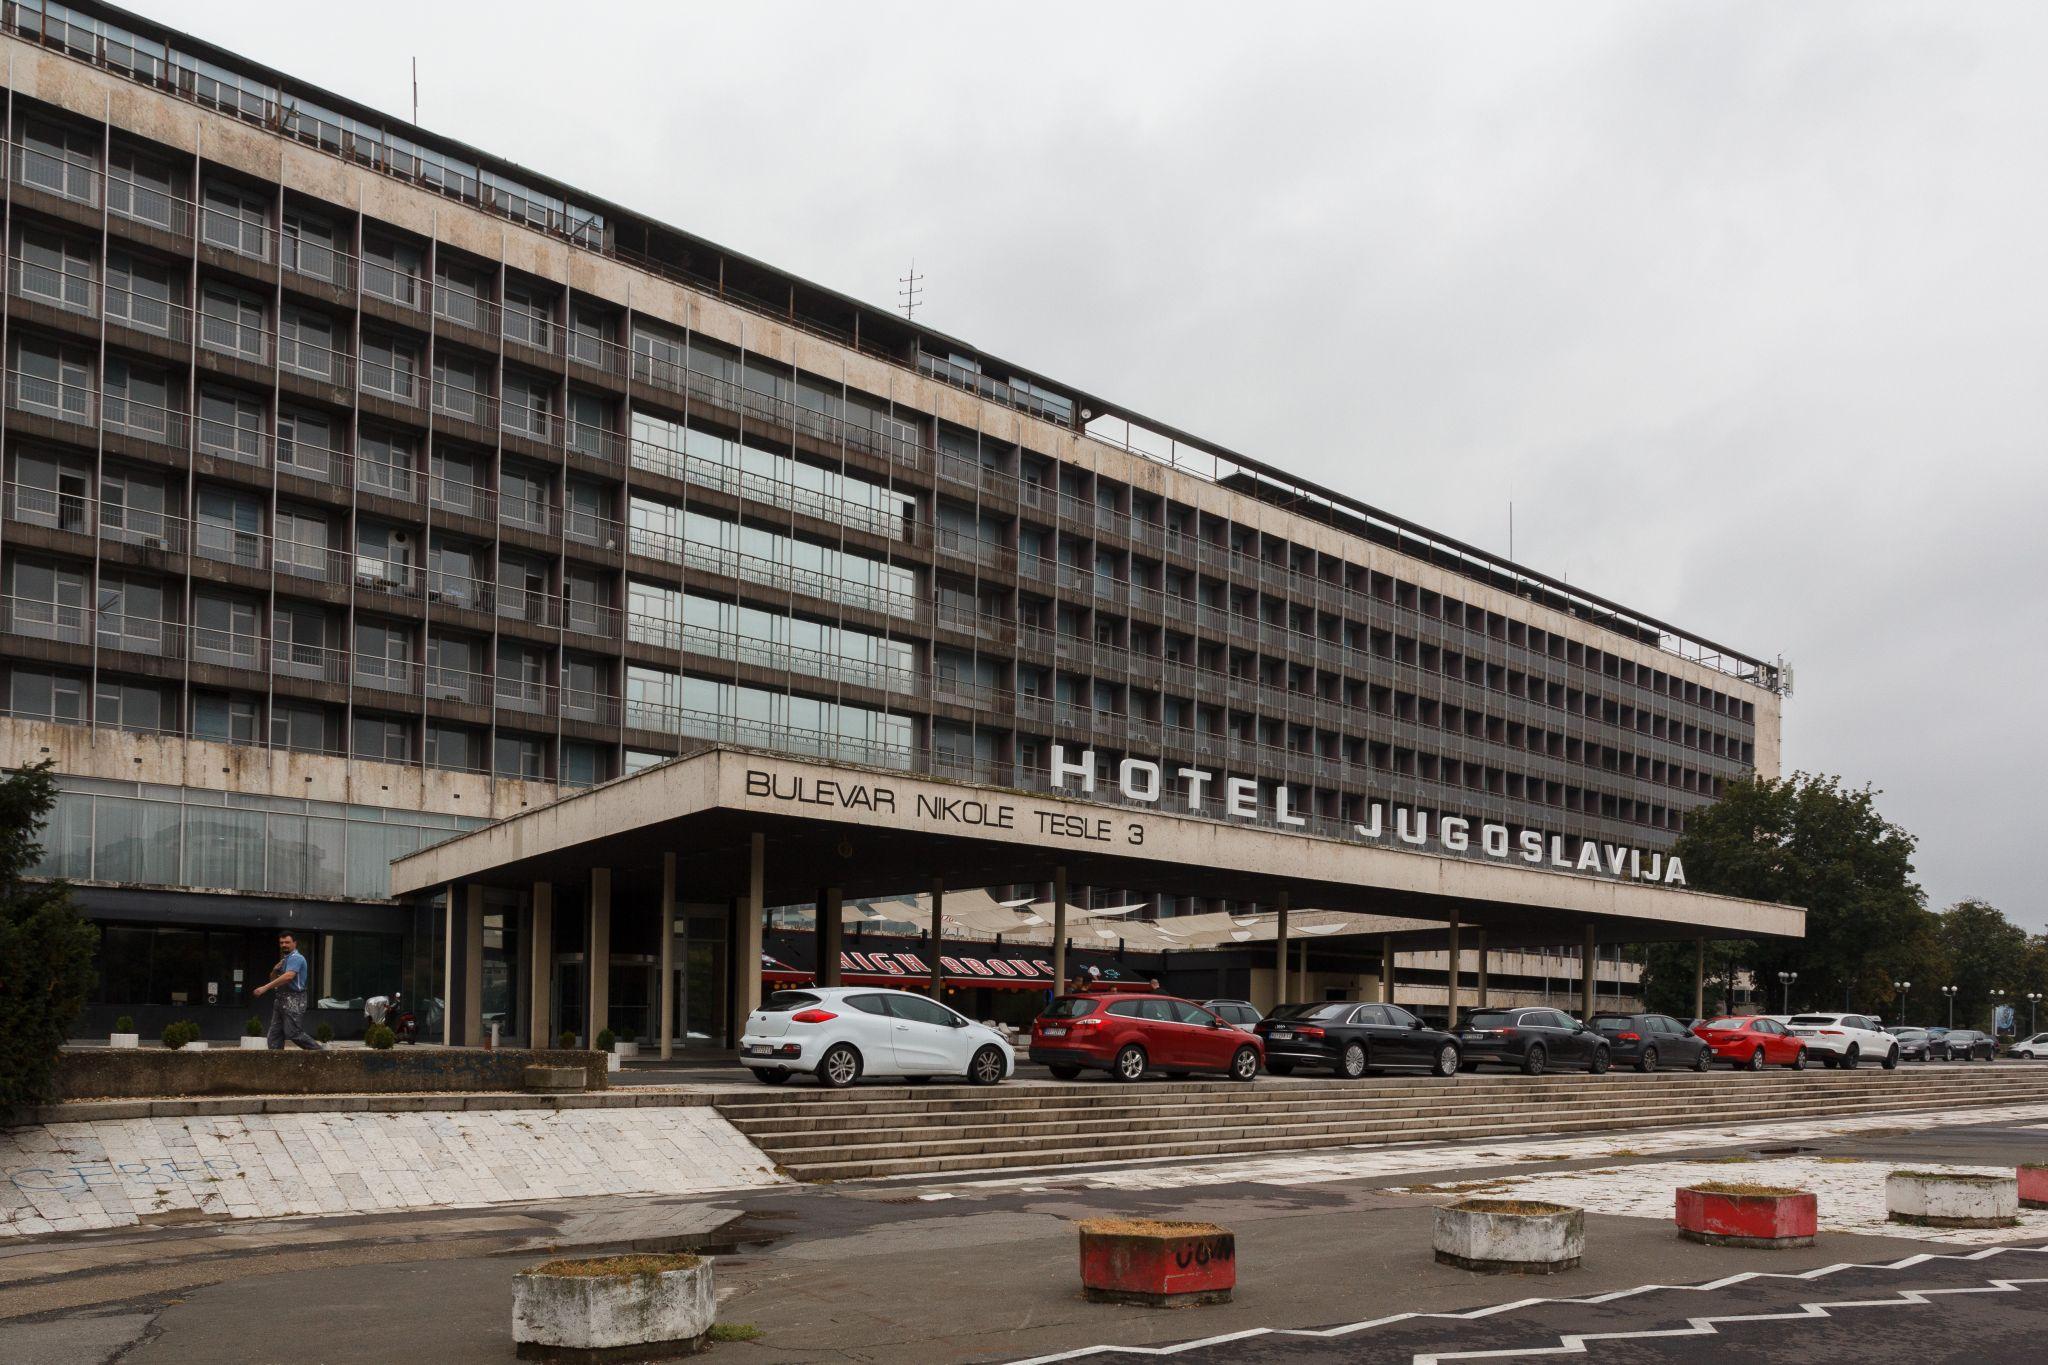 Hotel Jugoslavija, Serbia